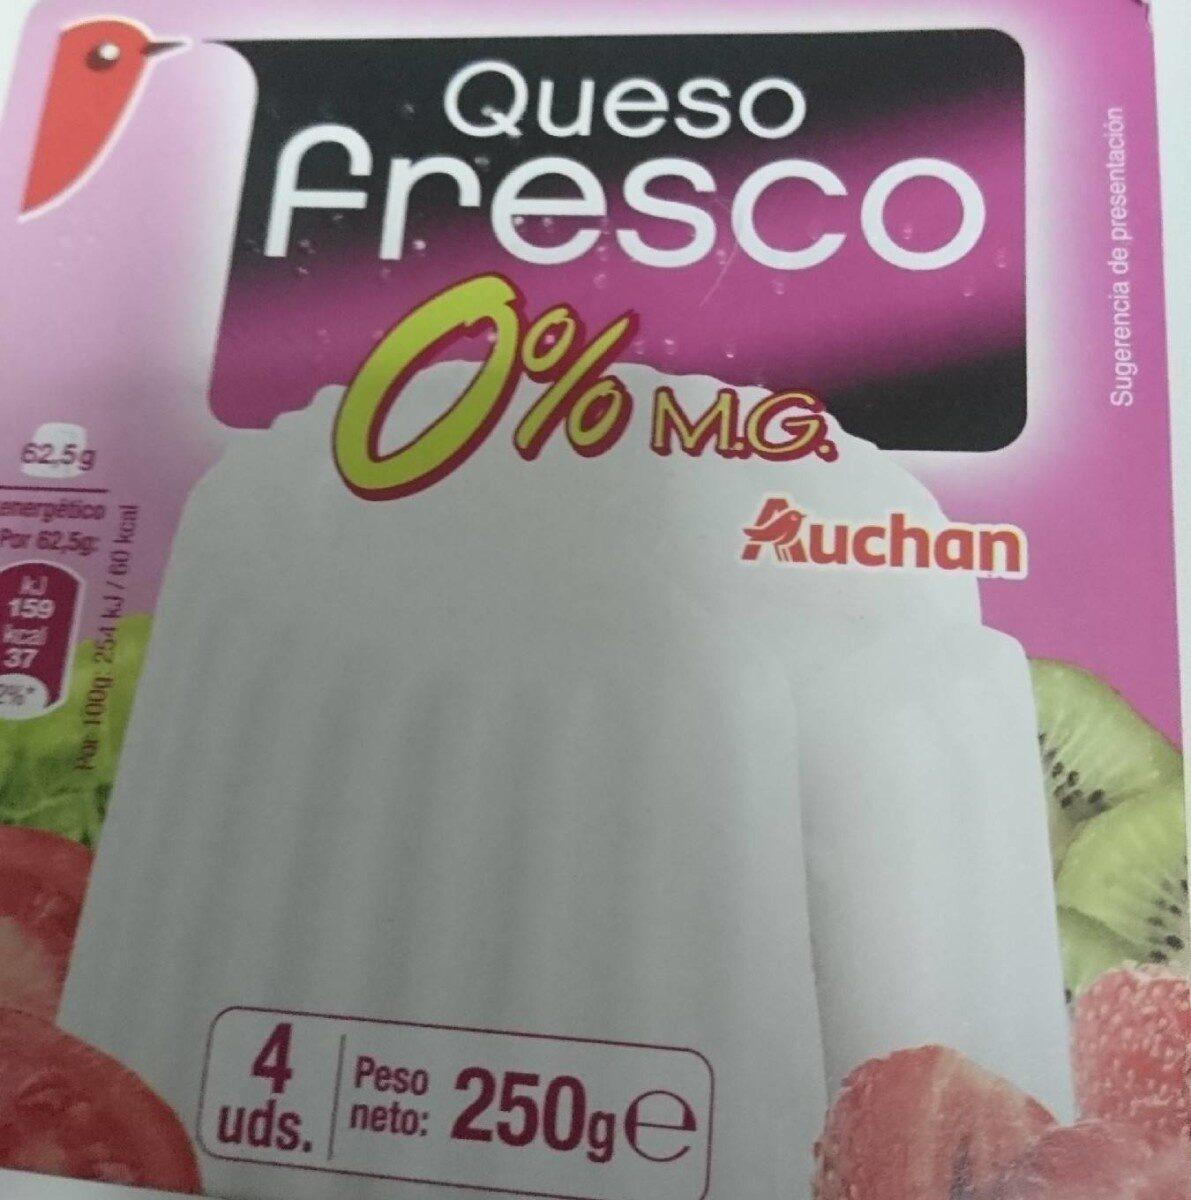 Queso fresco 0% - Product - es